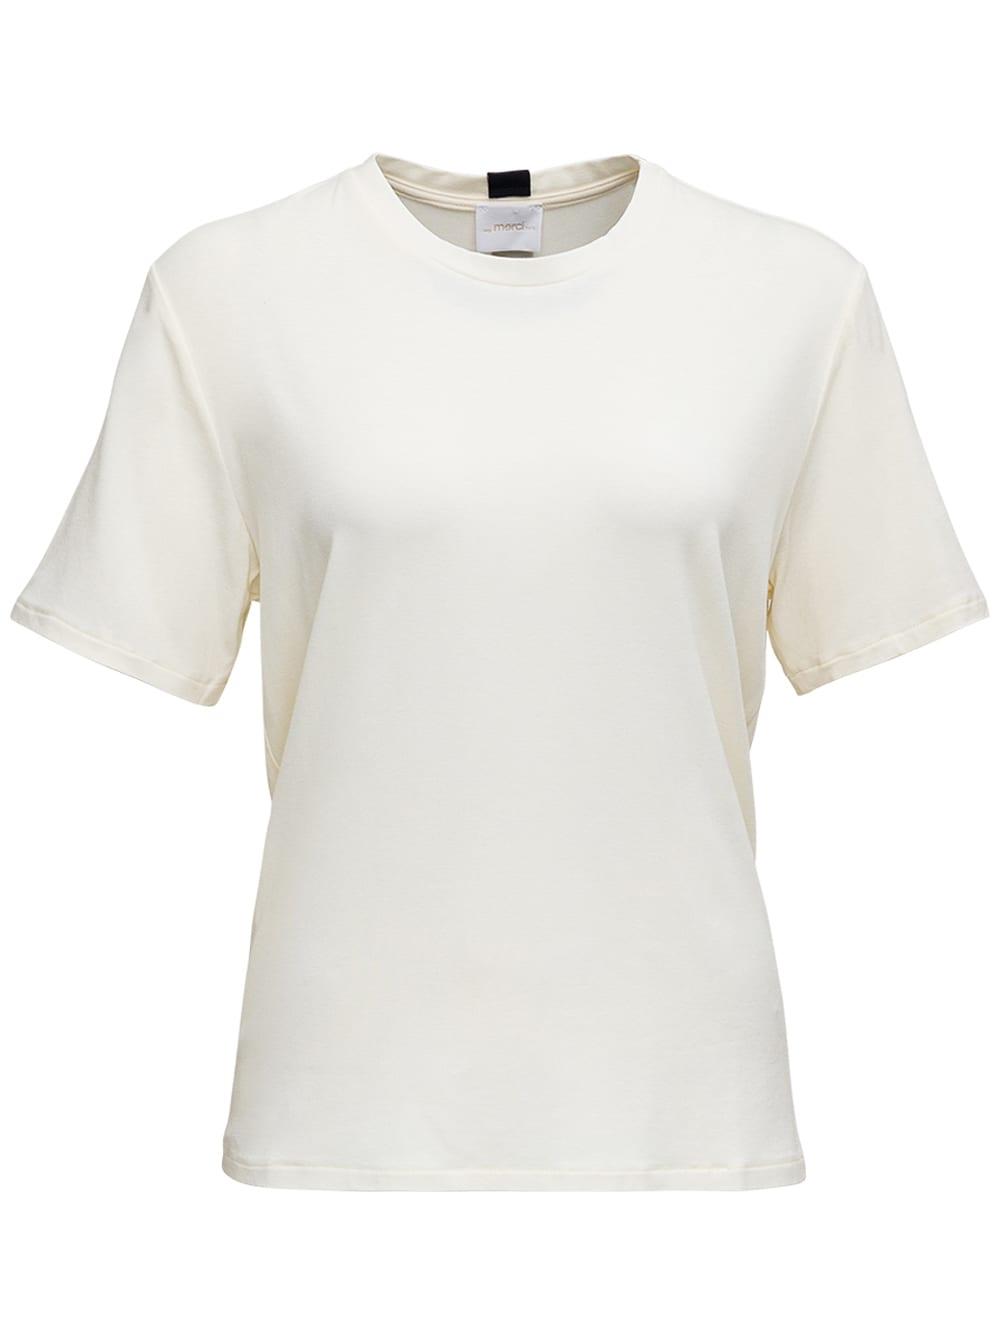 White Round Neck T-shirt In Viscose Blend